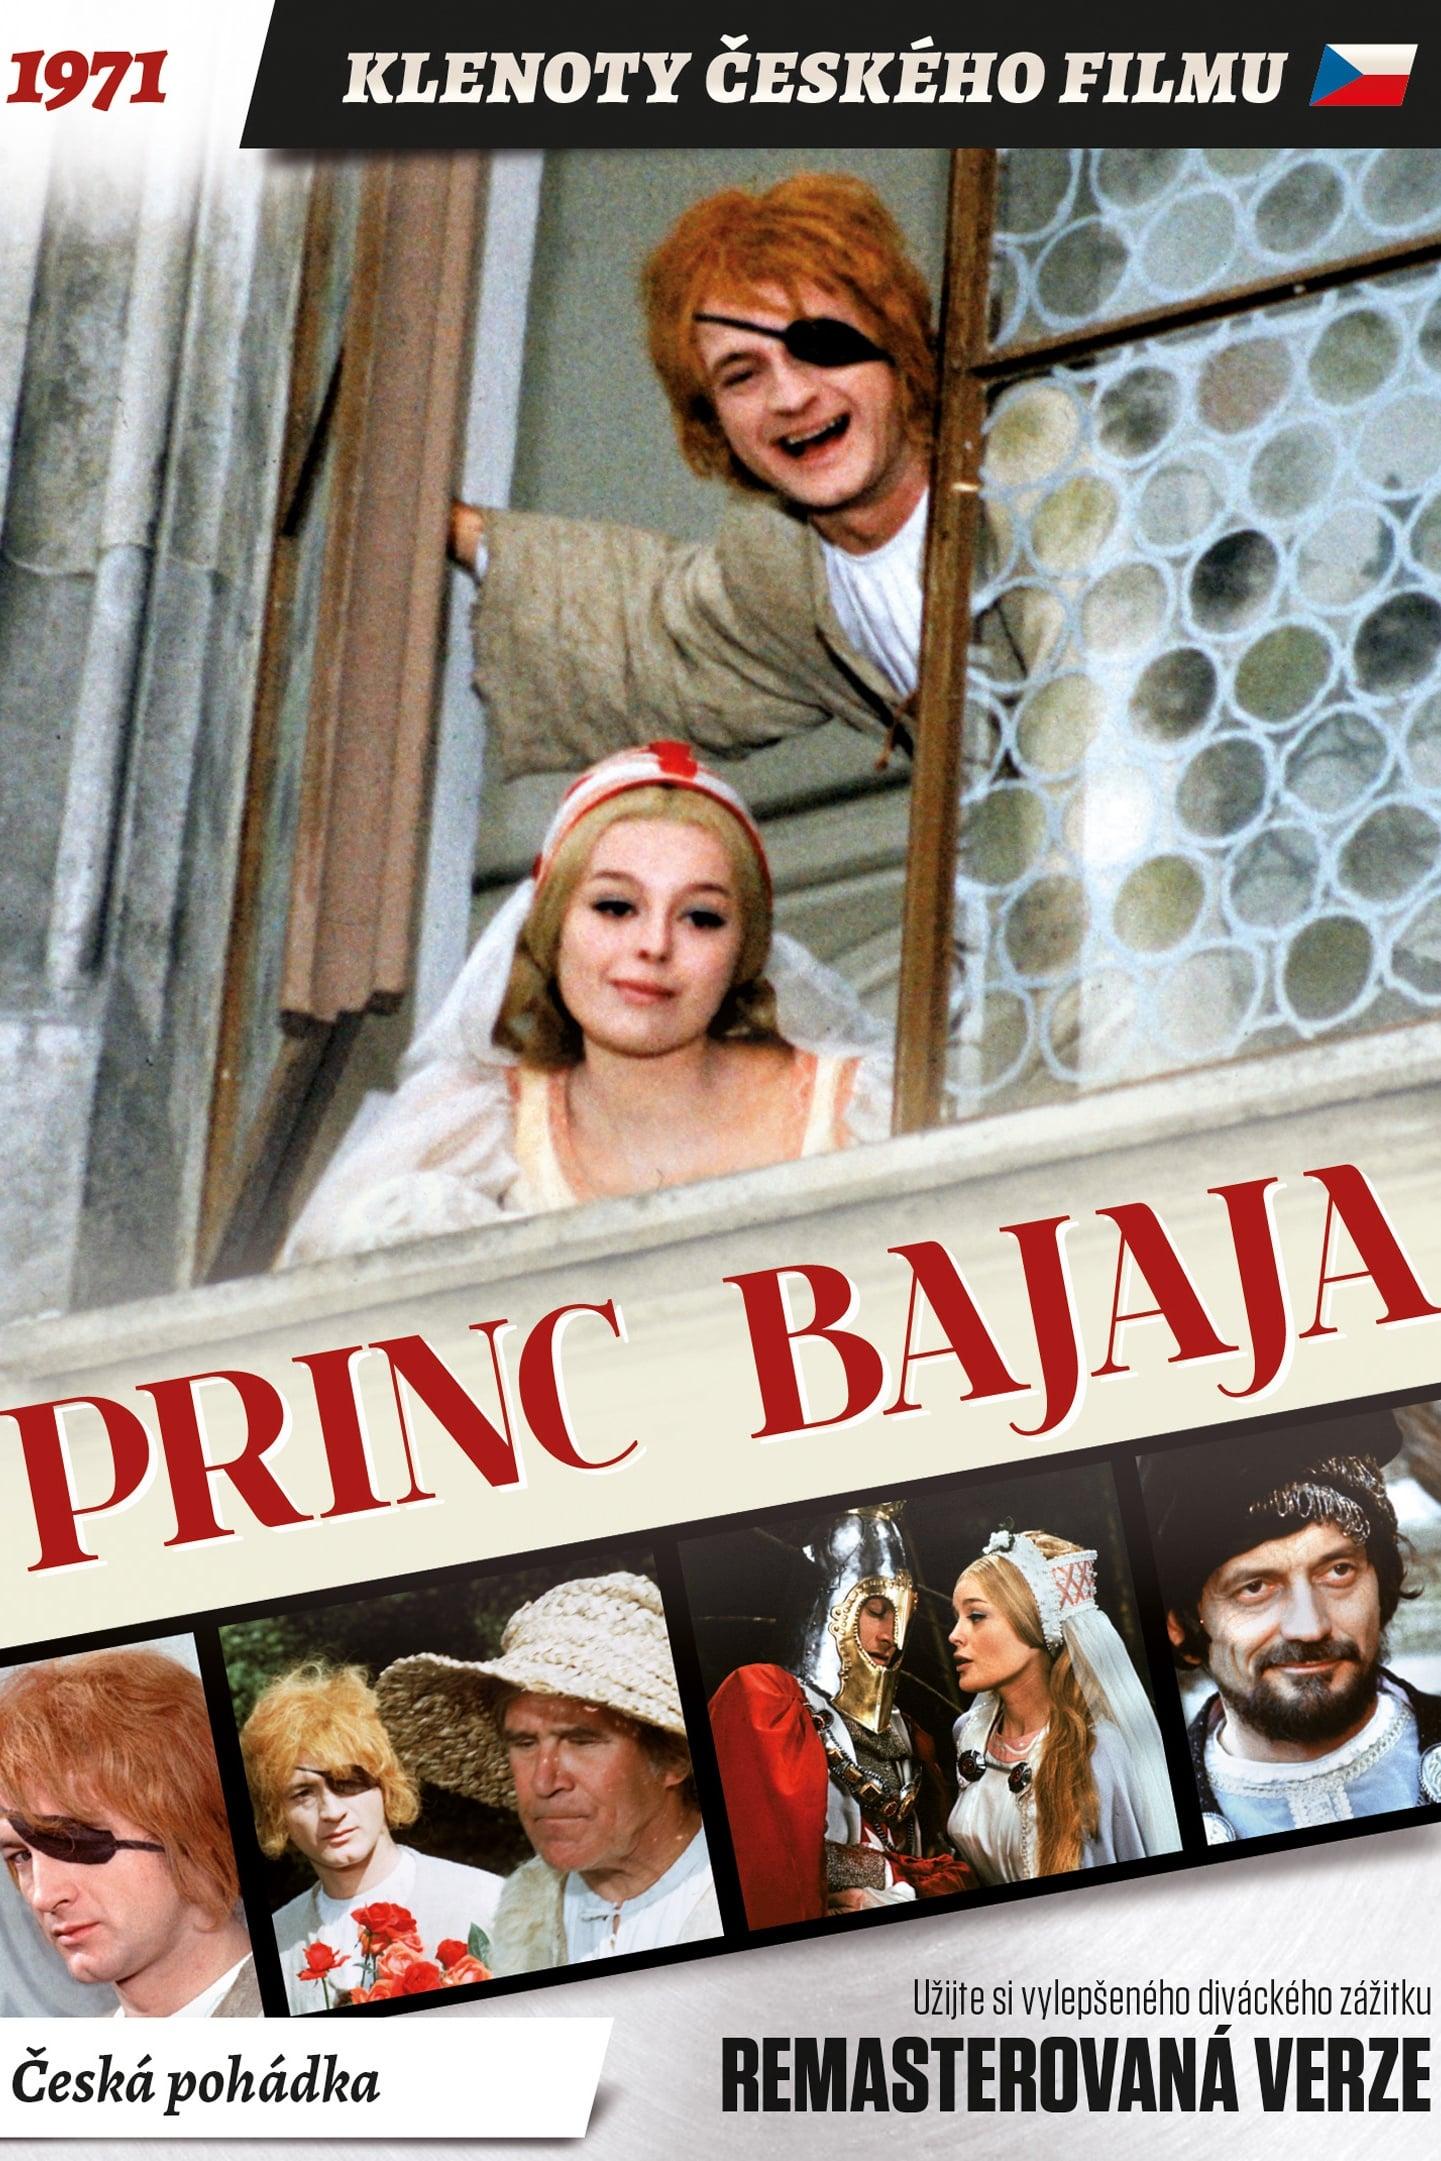 Prince Bajaja